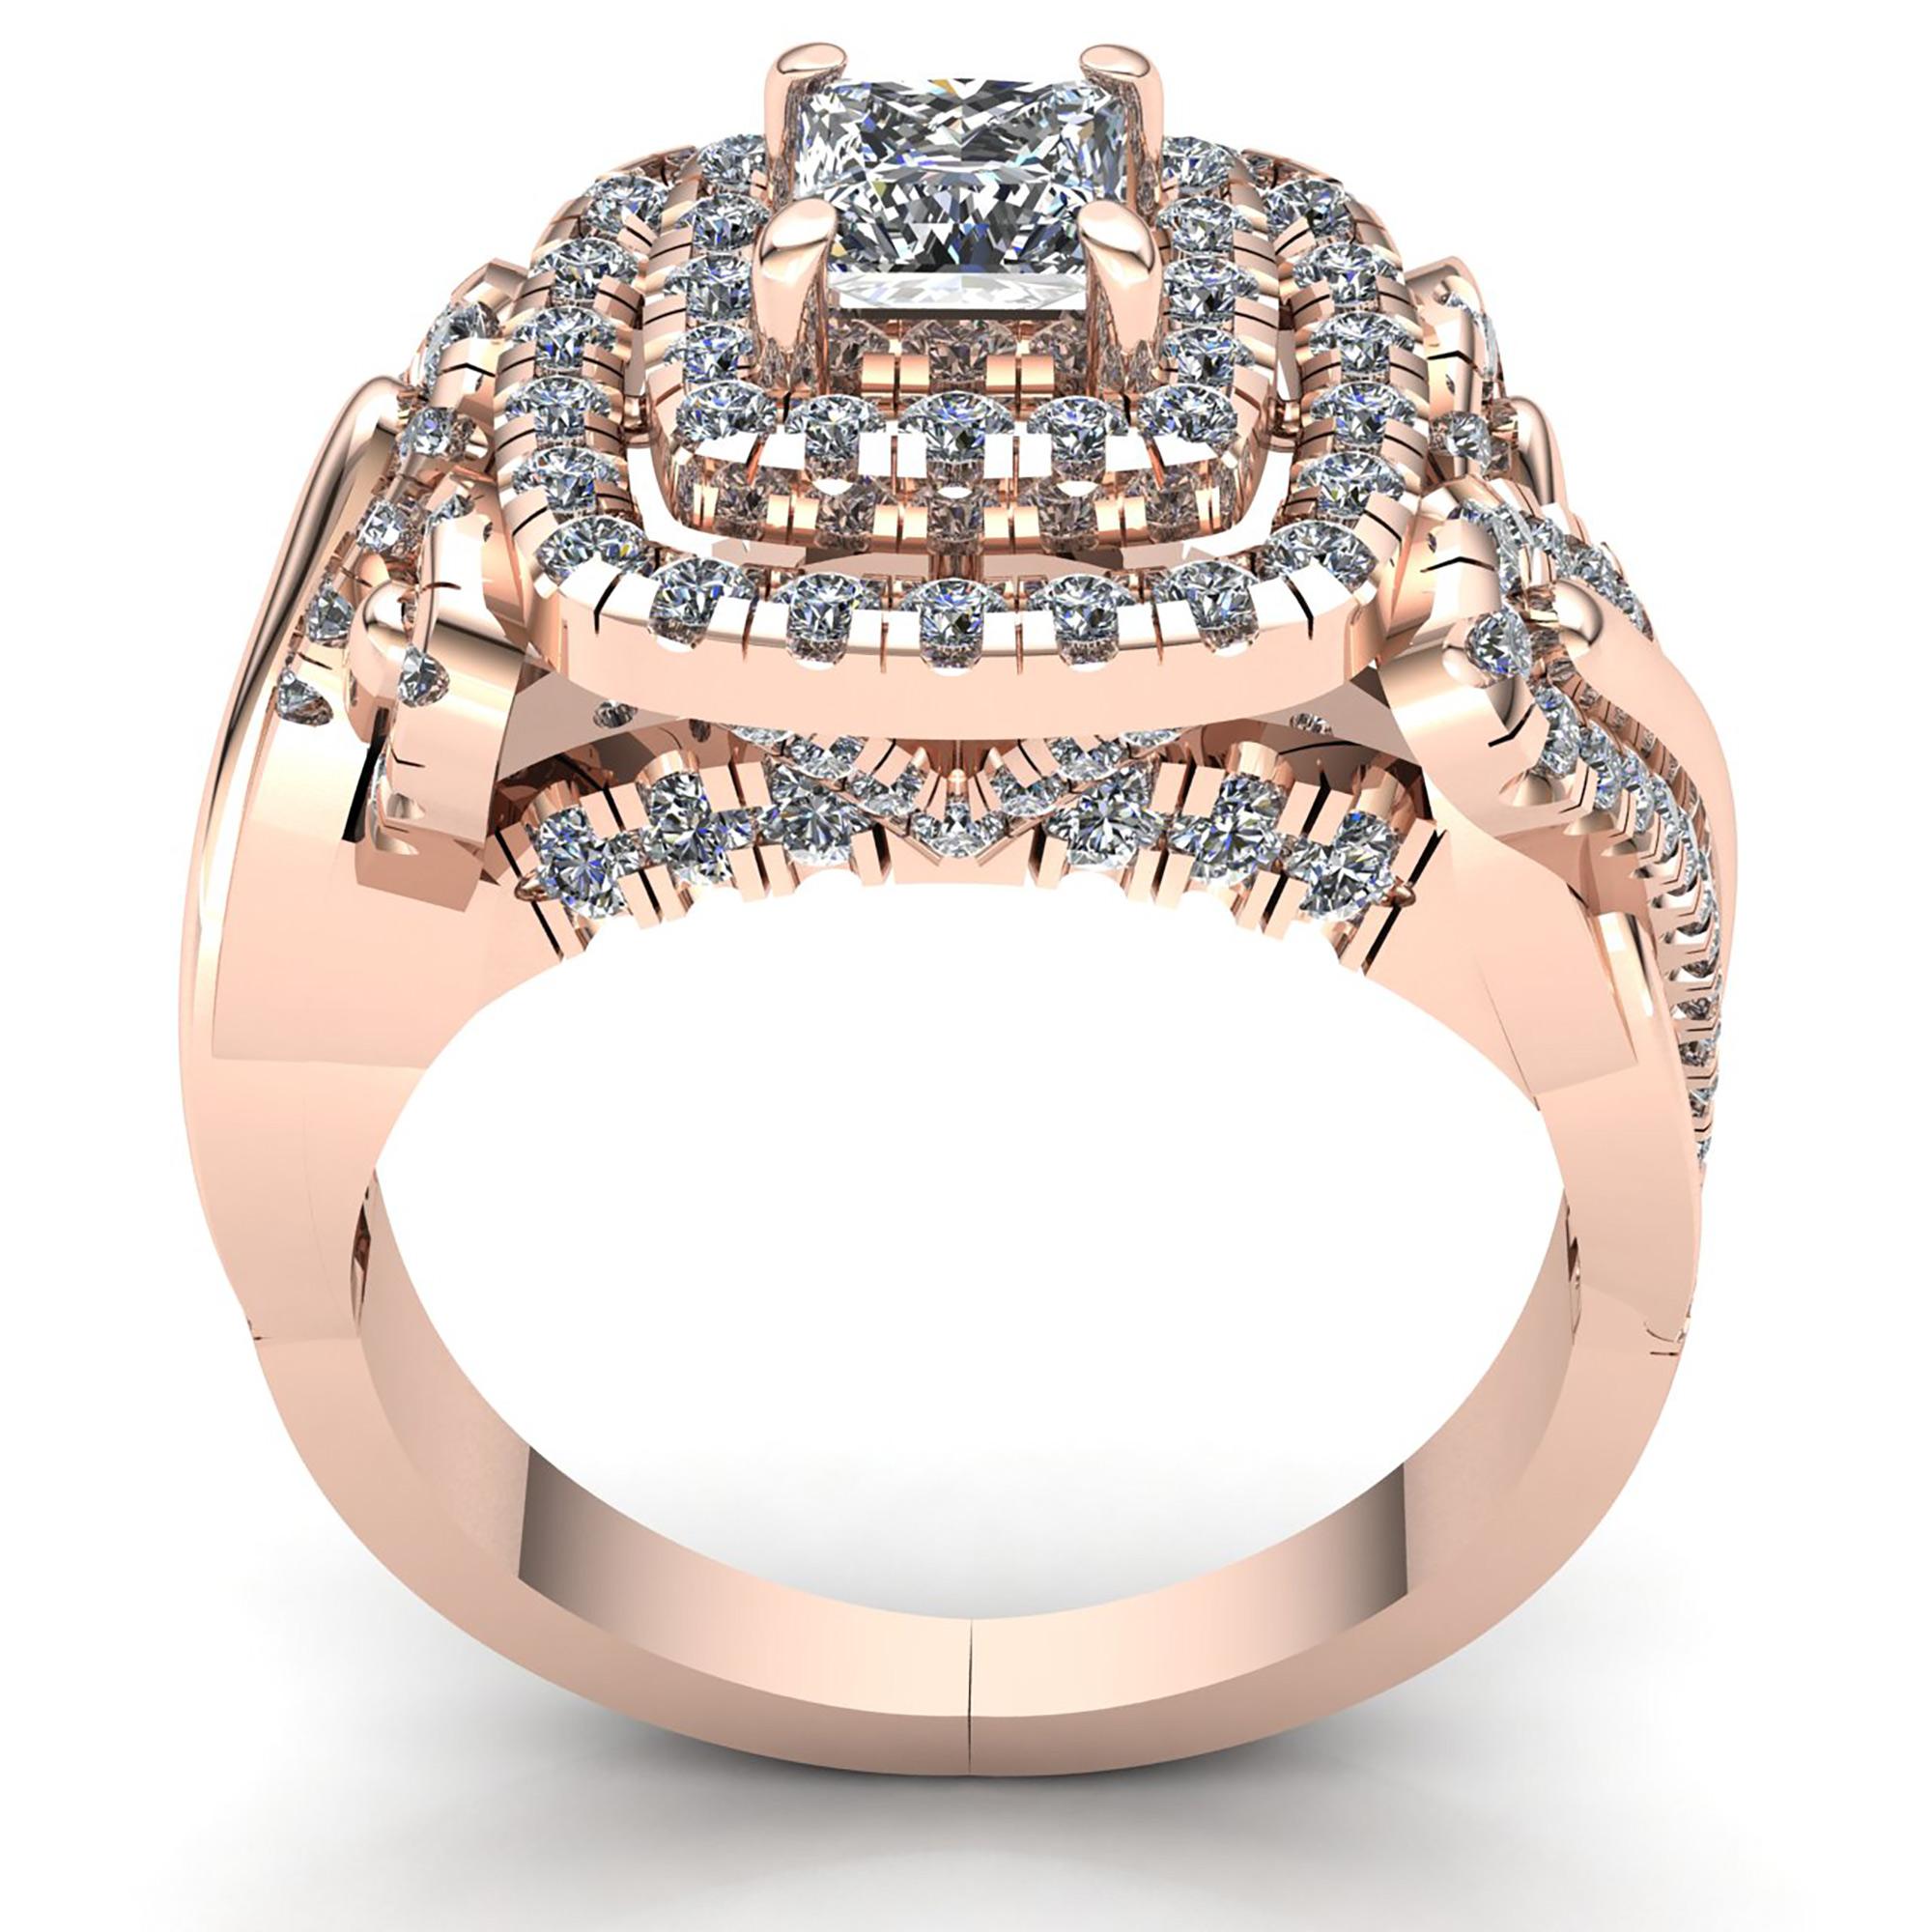 Natural-3-Quilates-Diamante-Talla-Princesa-Mujer-Doble-Halo-Anillo-de-Compromiso miniatura 8